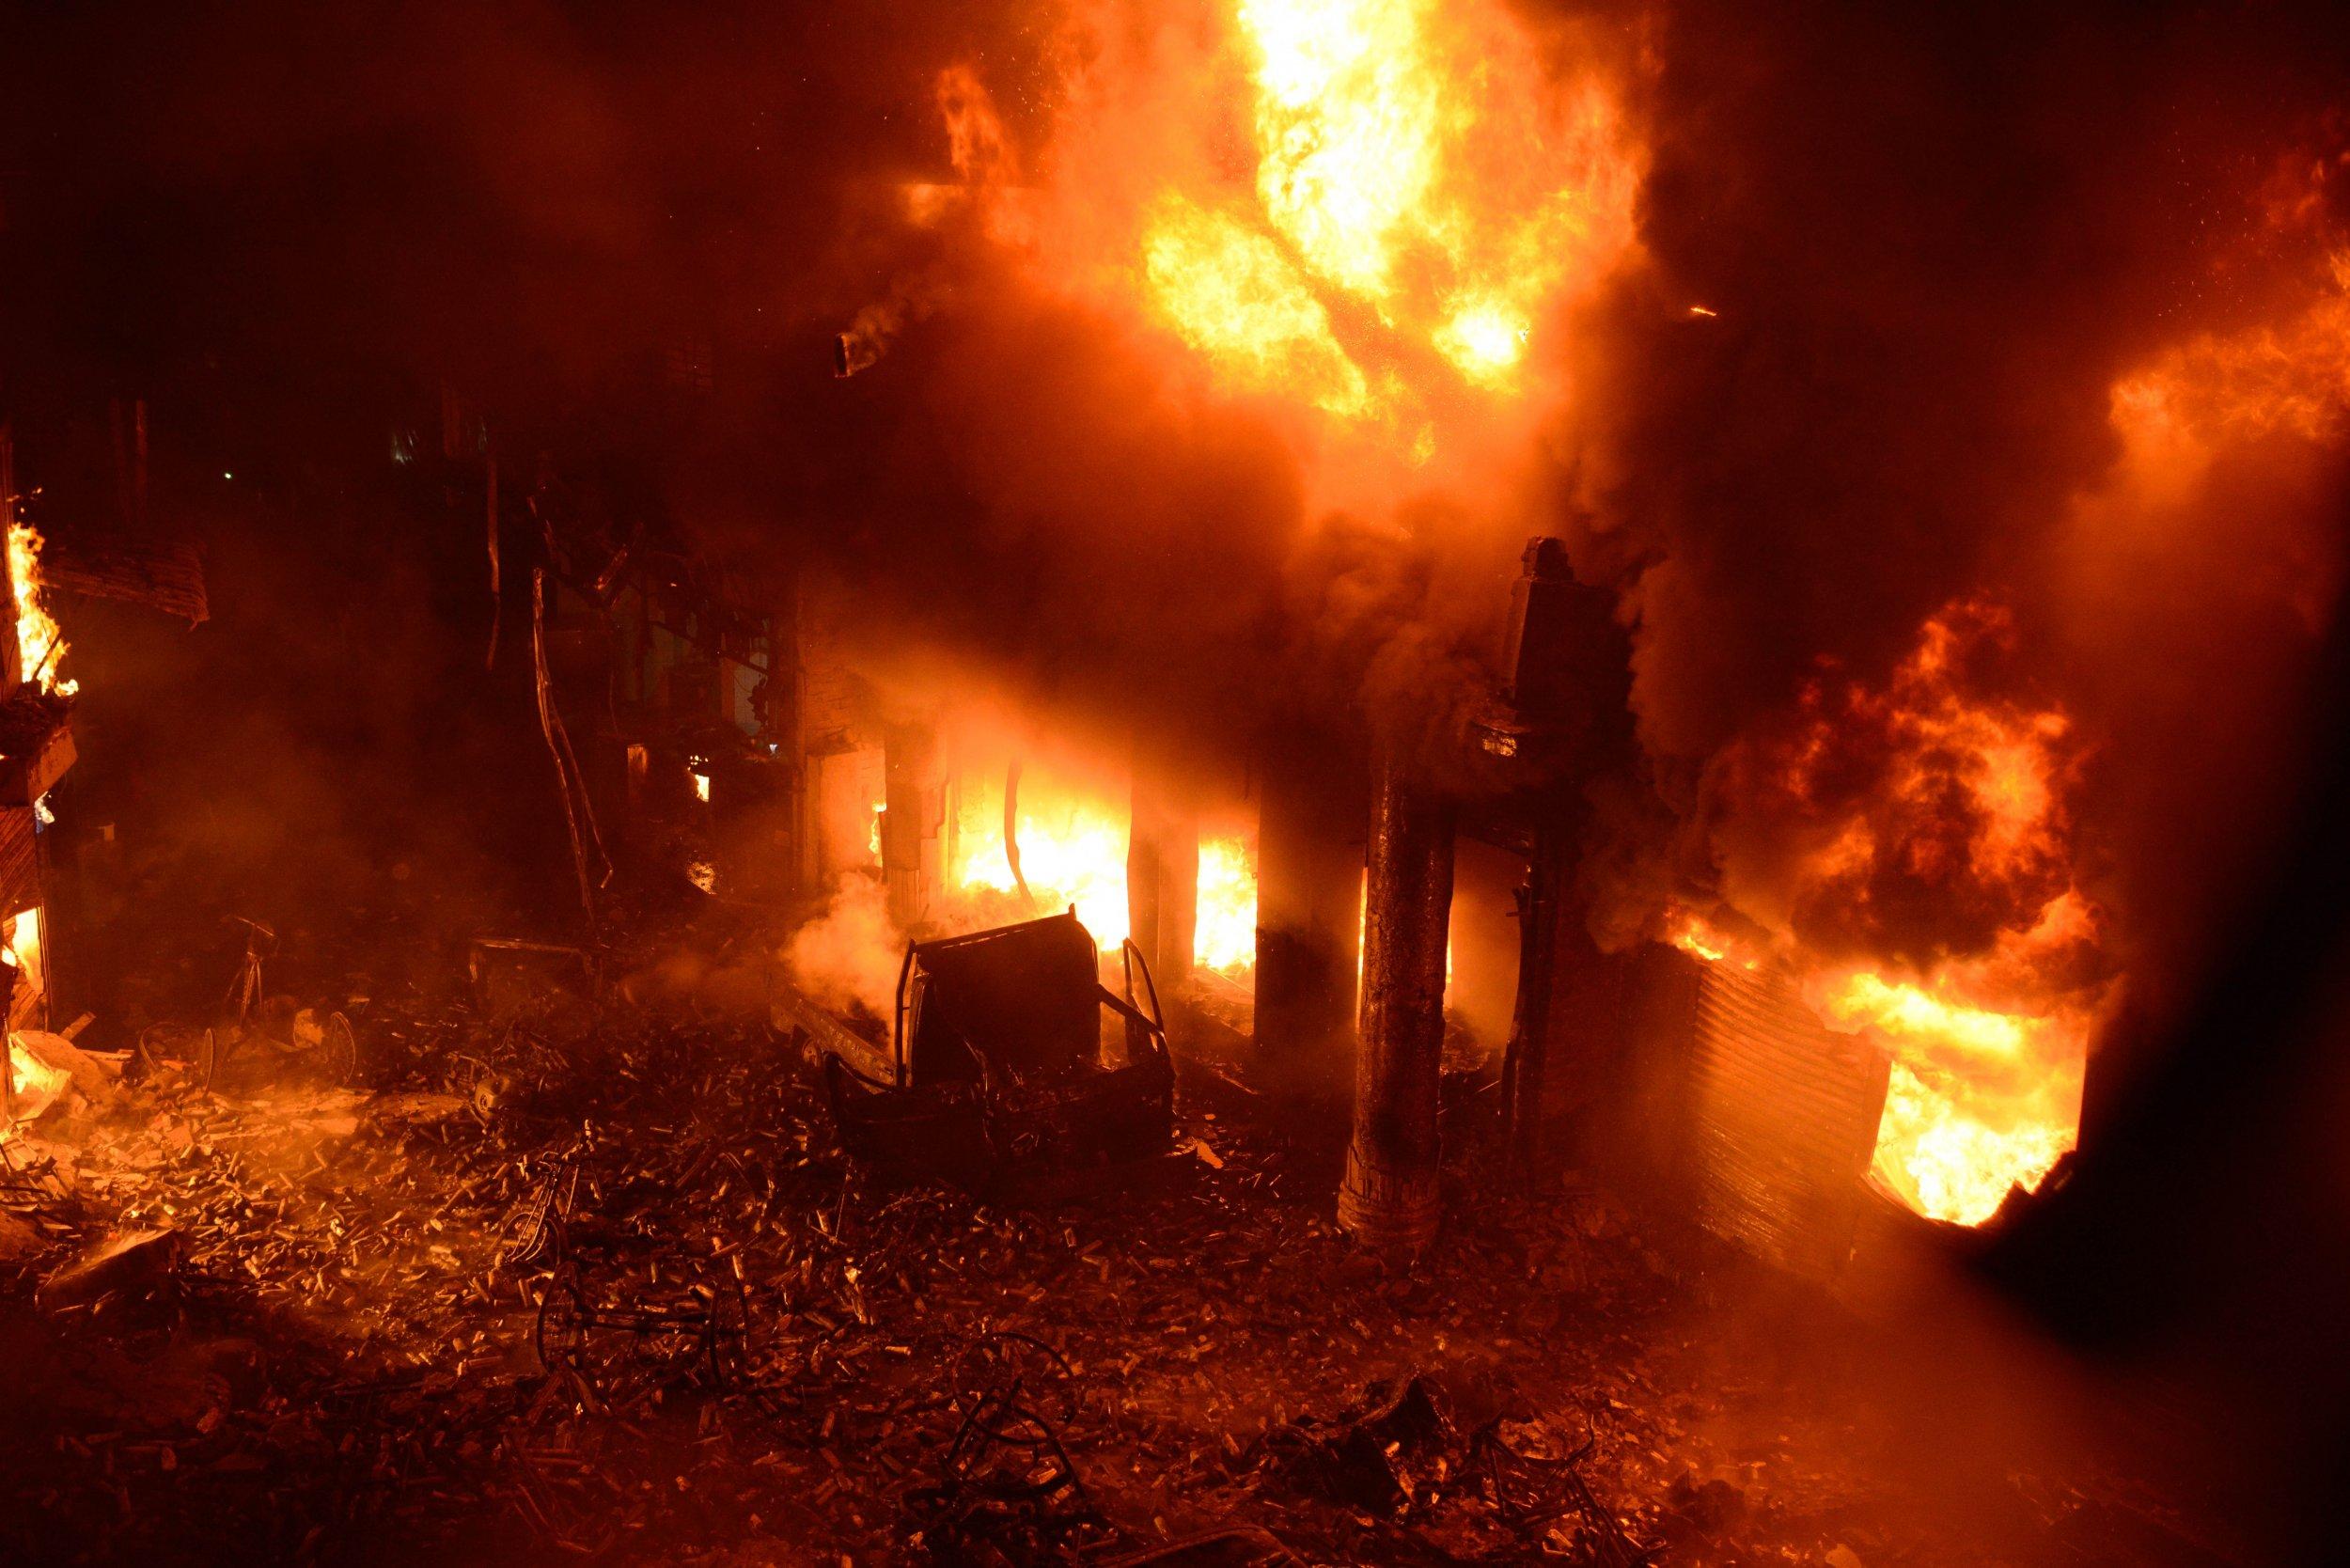 Dhaka fire Bangladesh apartments trapped warehouses